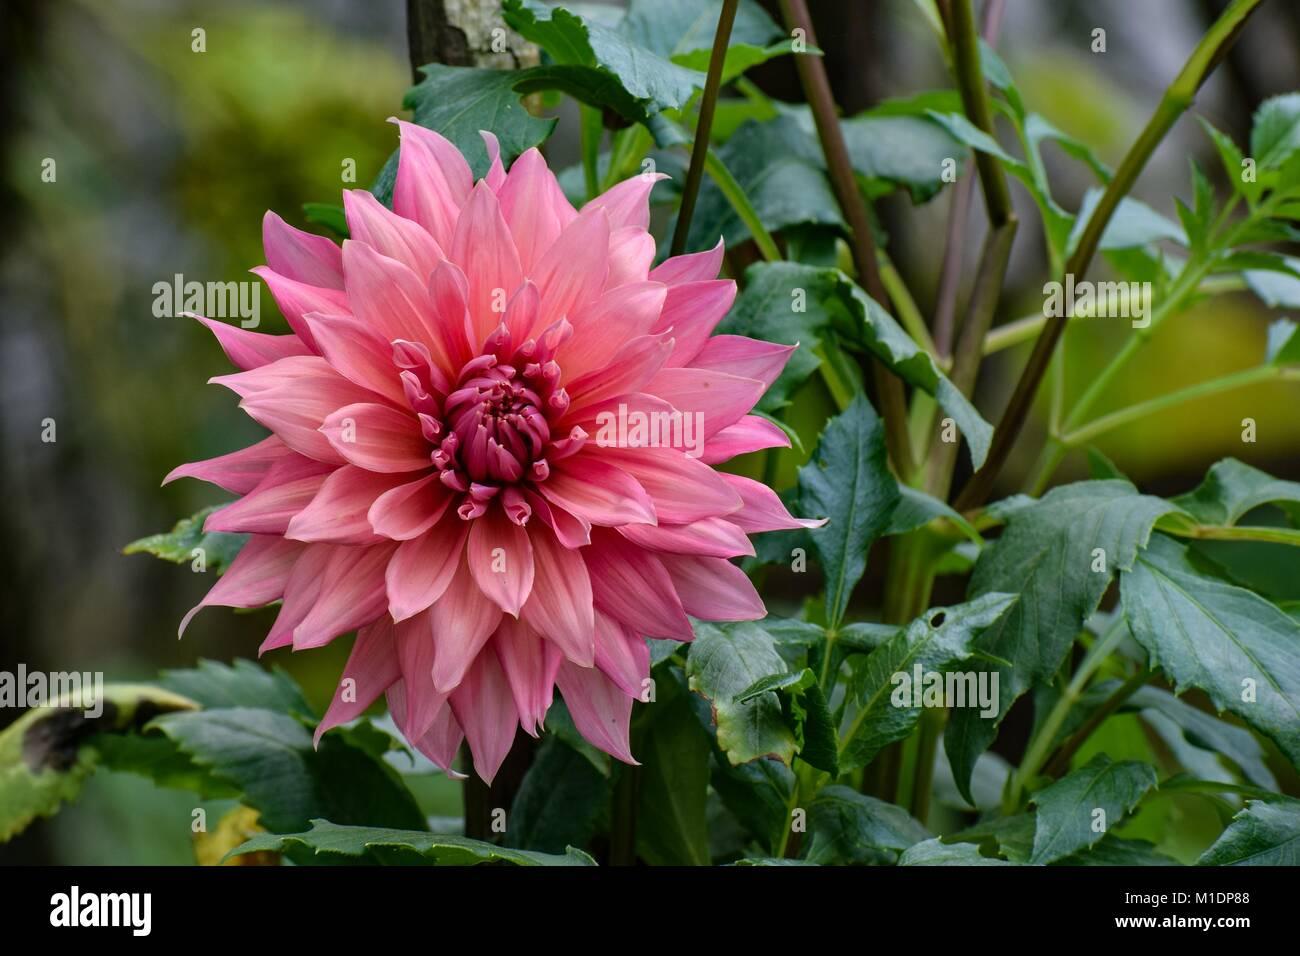 India Dahlia Flower Stock Photos India Dahlia Flower Stock Images